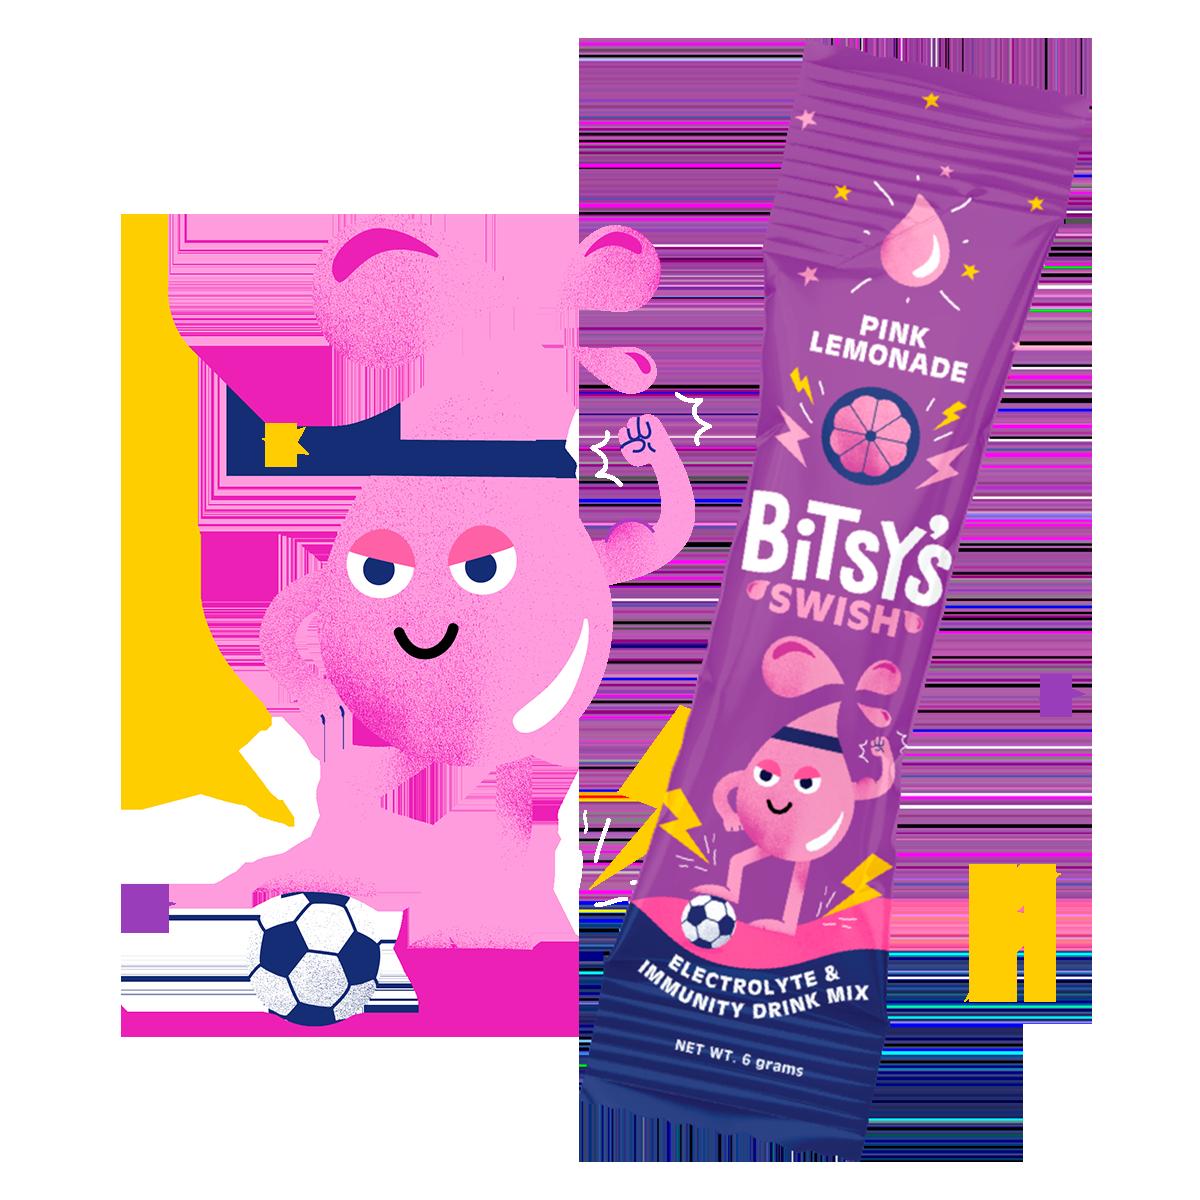 Bitsy's Swish Pink Lemonade